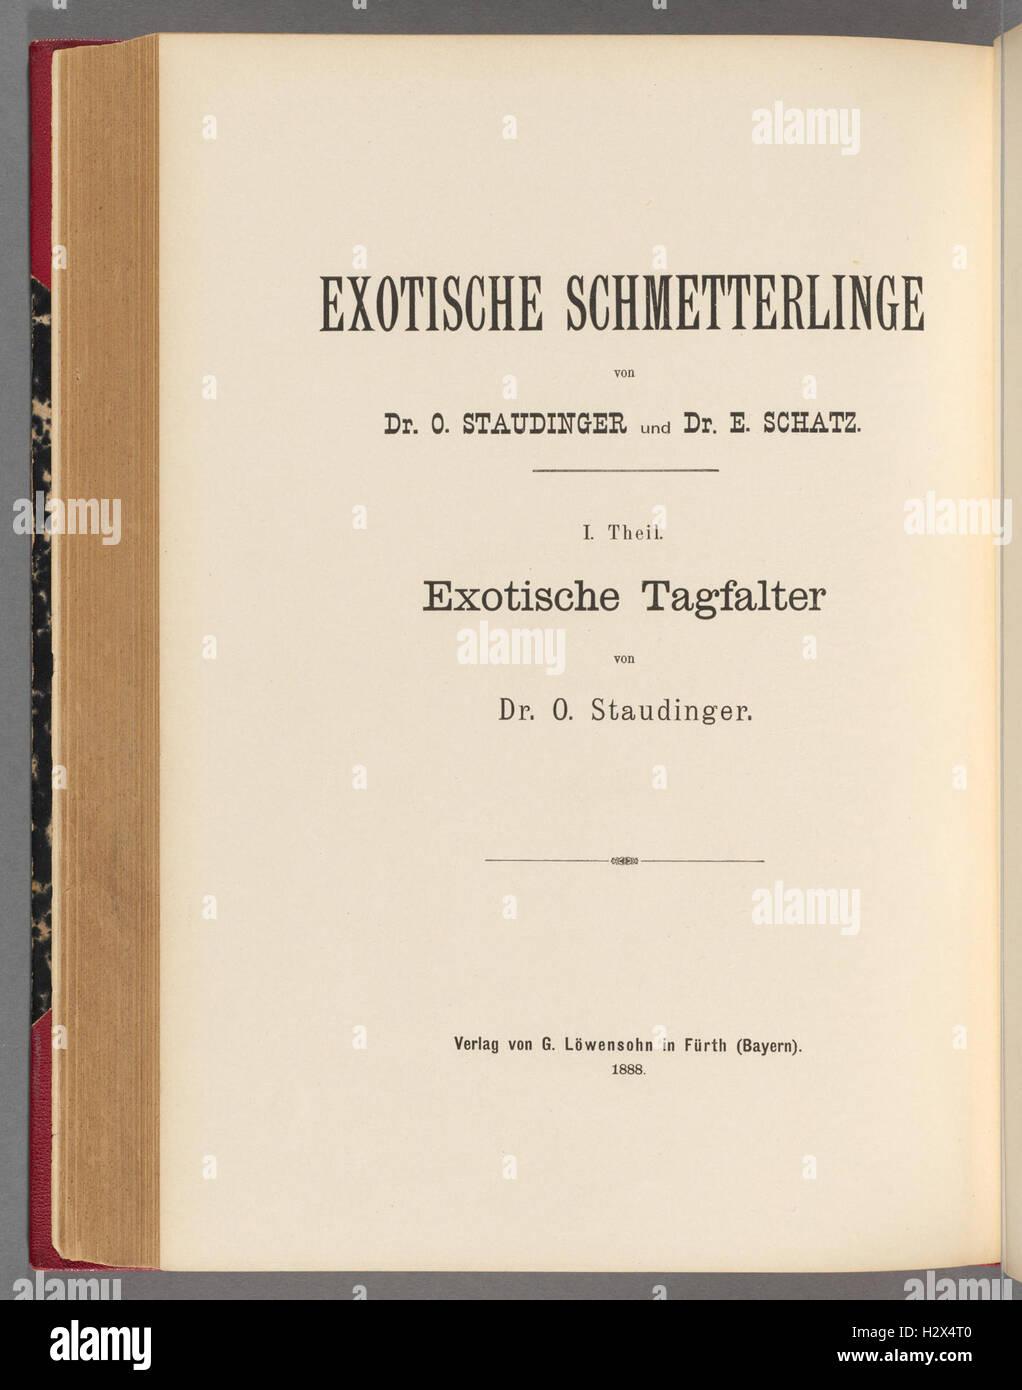 Exotische schmetterlinge BHL400 - Stock Image